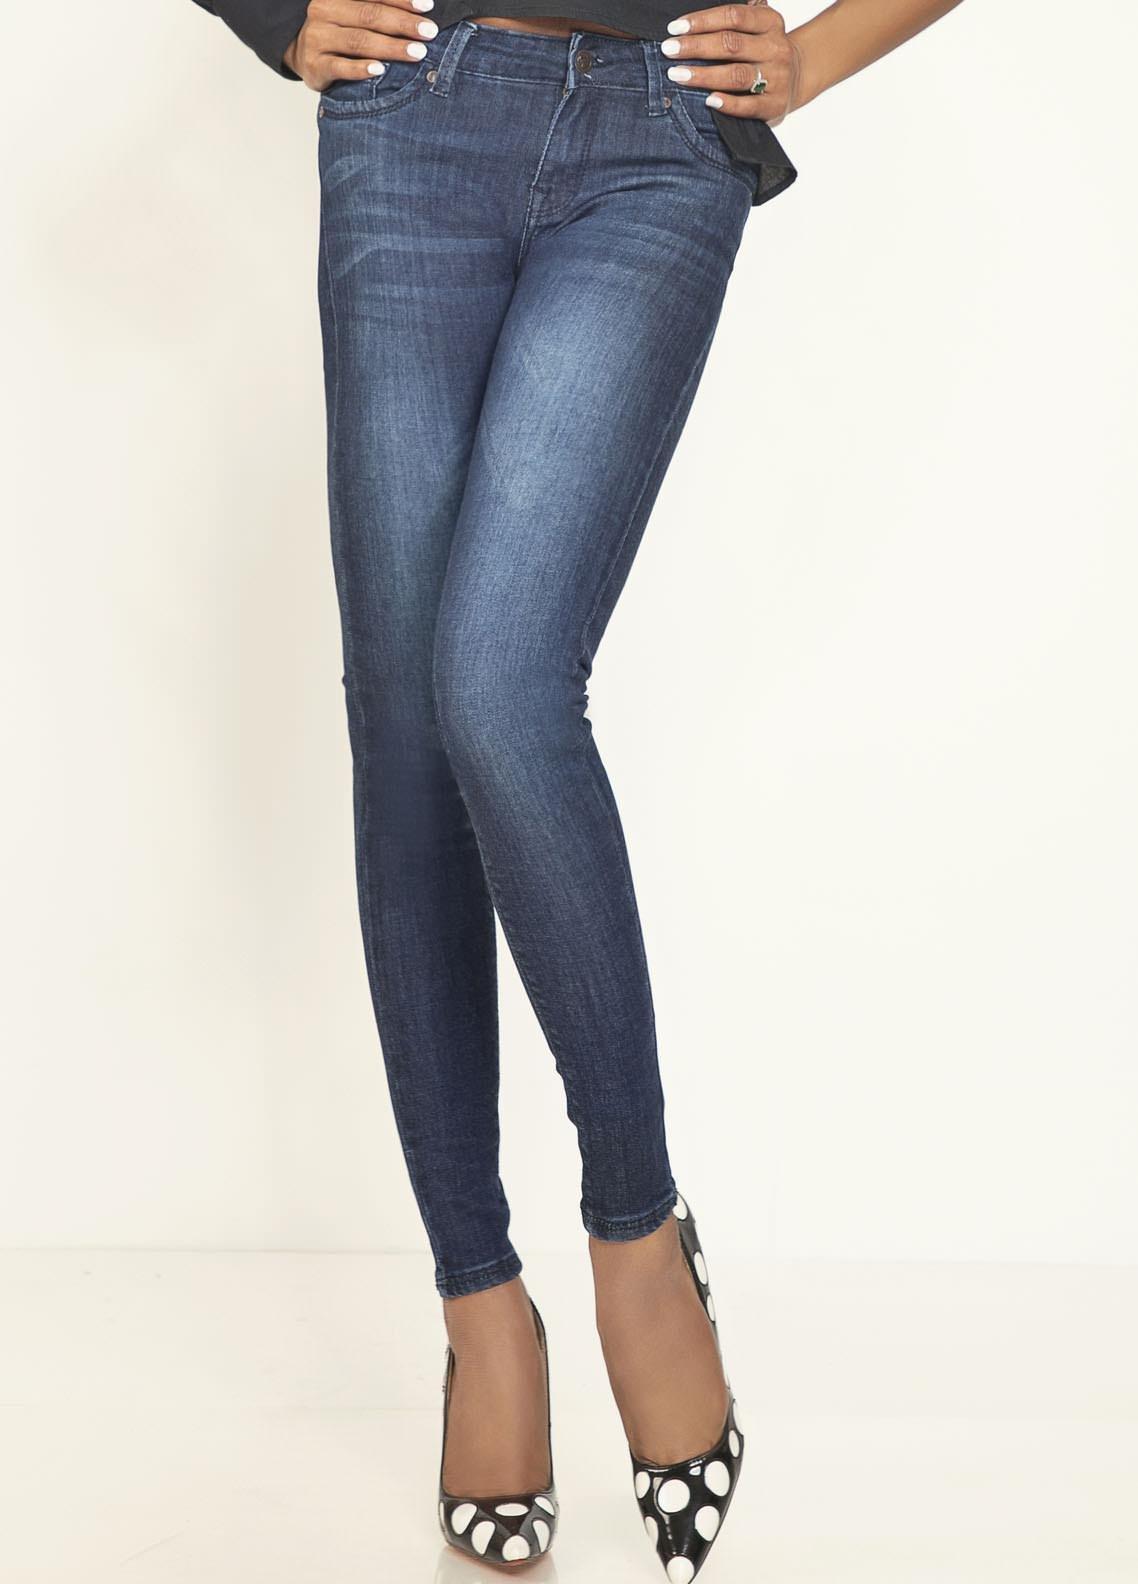 Kross Kulture Perfect Curves Denim Jeans KWA-20-003 DGO